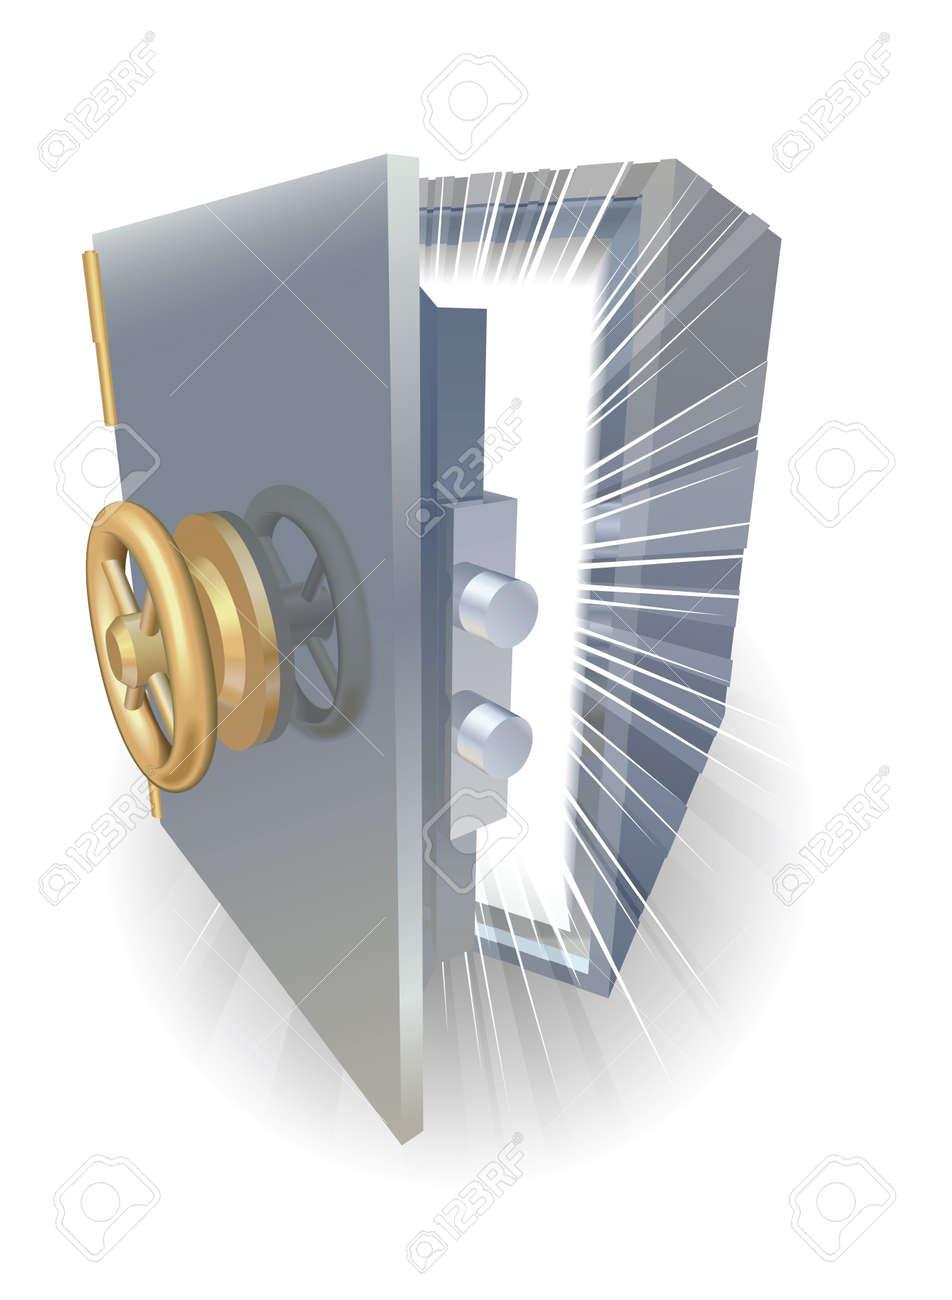 Safe opening containing something amazing Stock Vector - 9483380